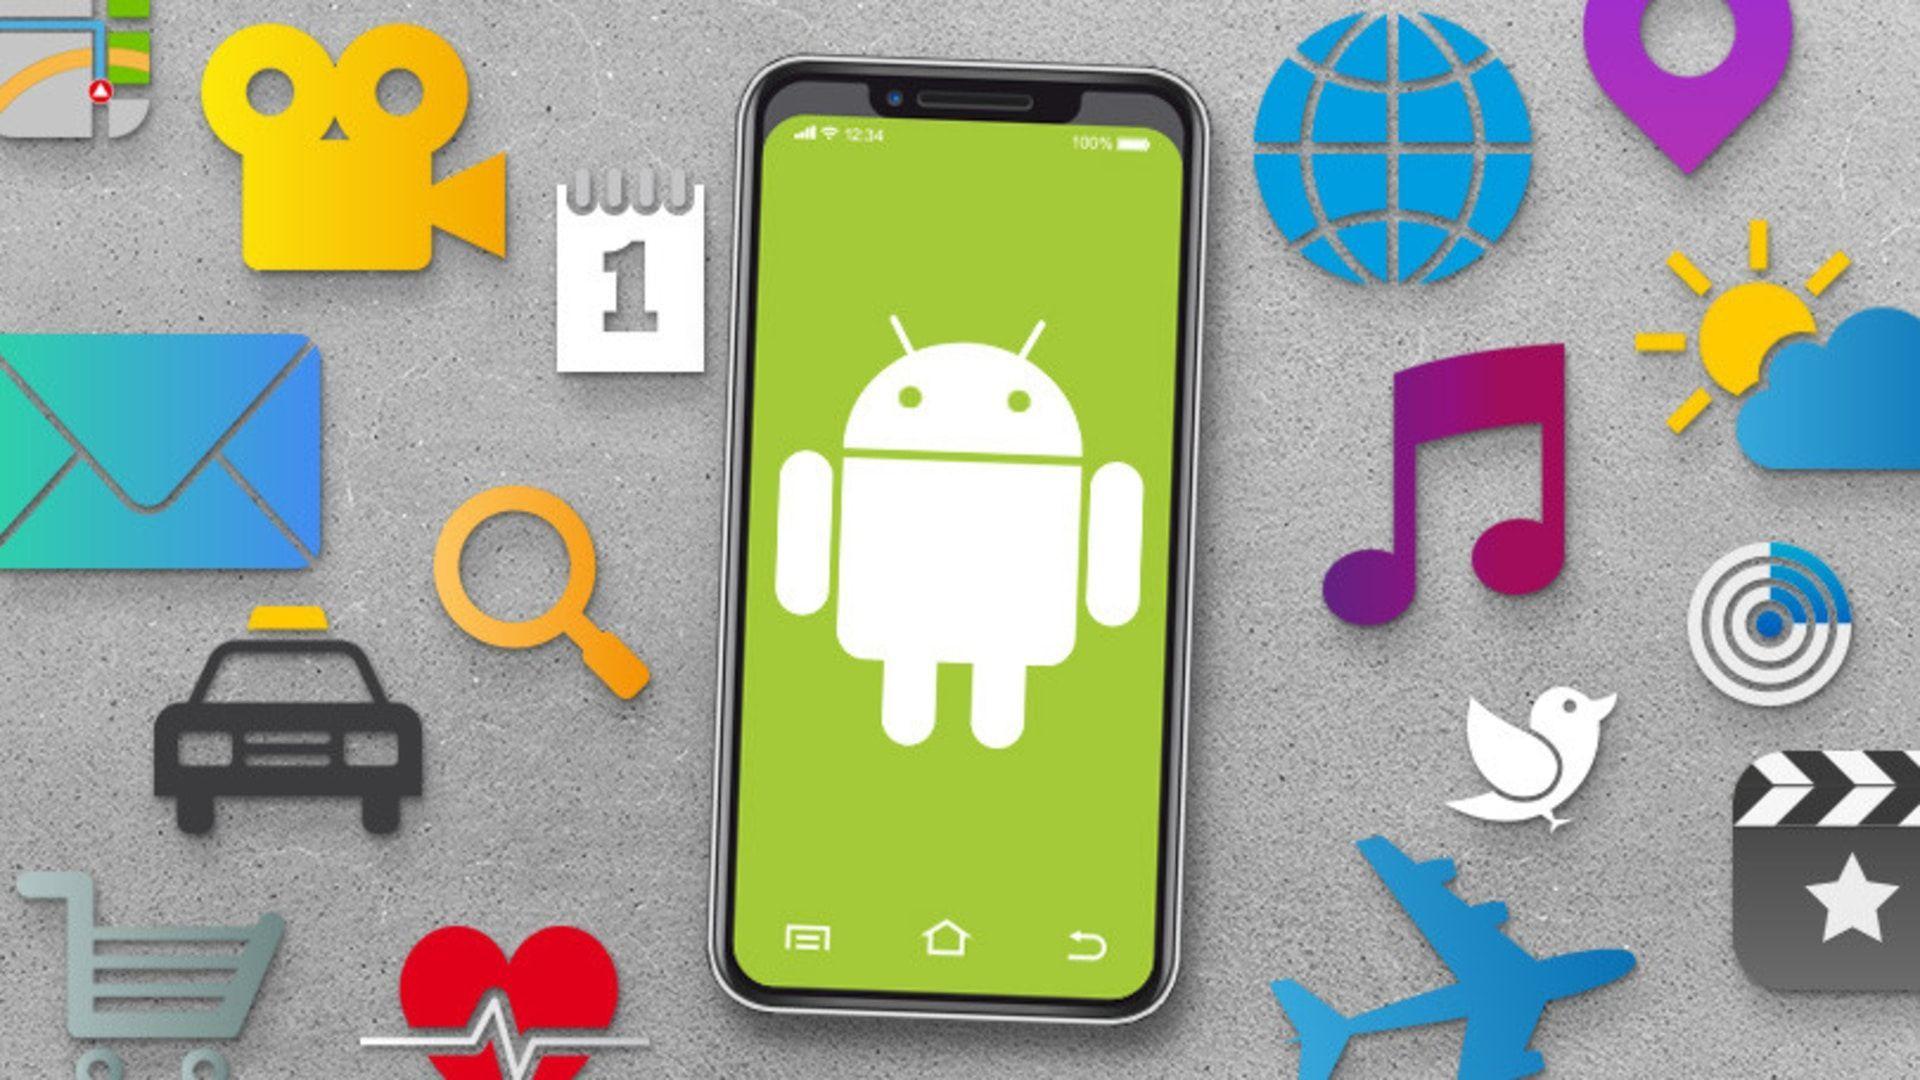 Как дистанционно устанавливать приложения на Android-смартфон